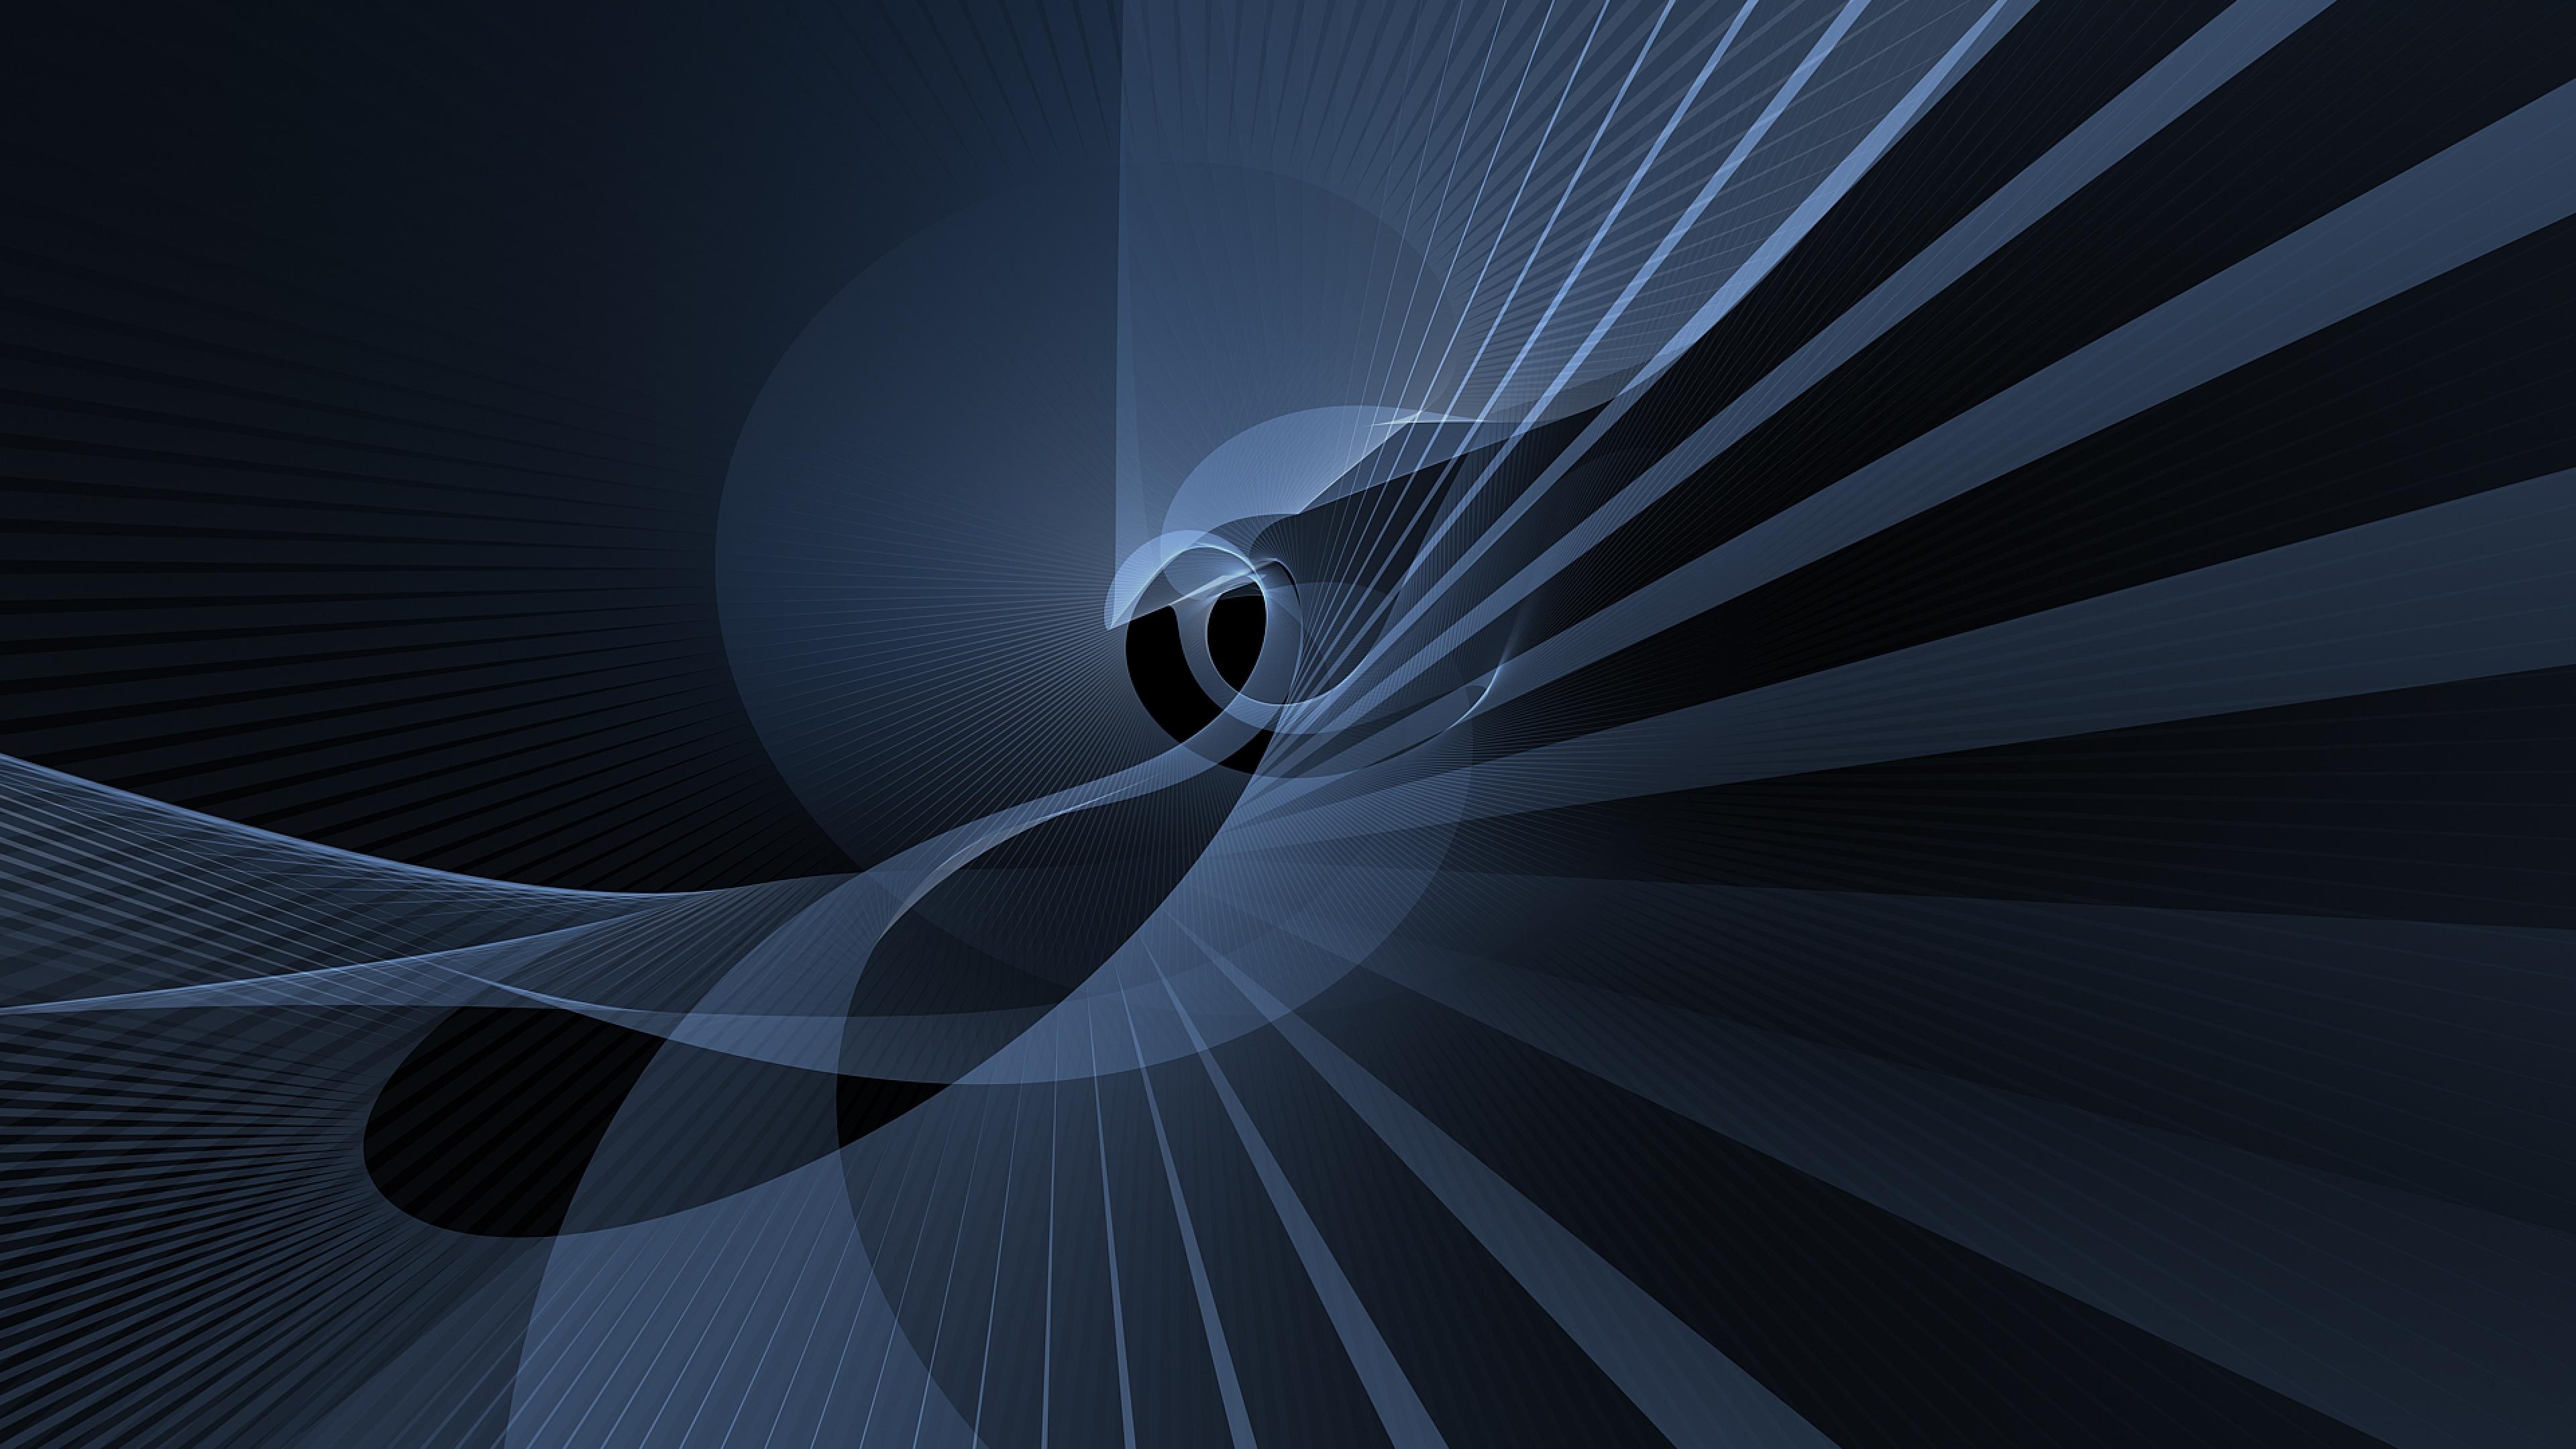 download 3840x2160 gray black - photo #35